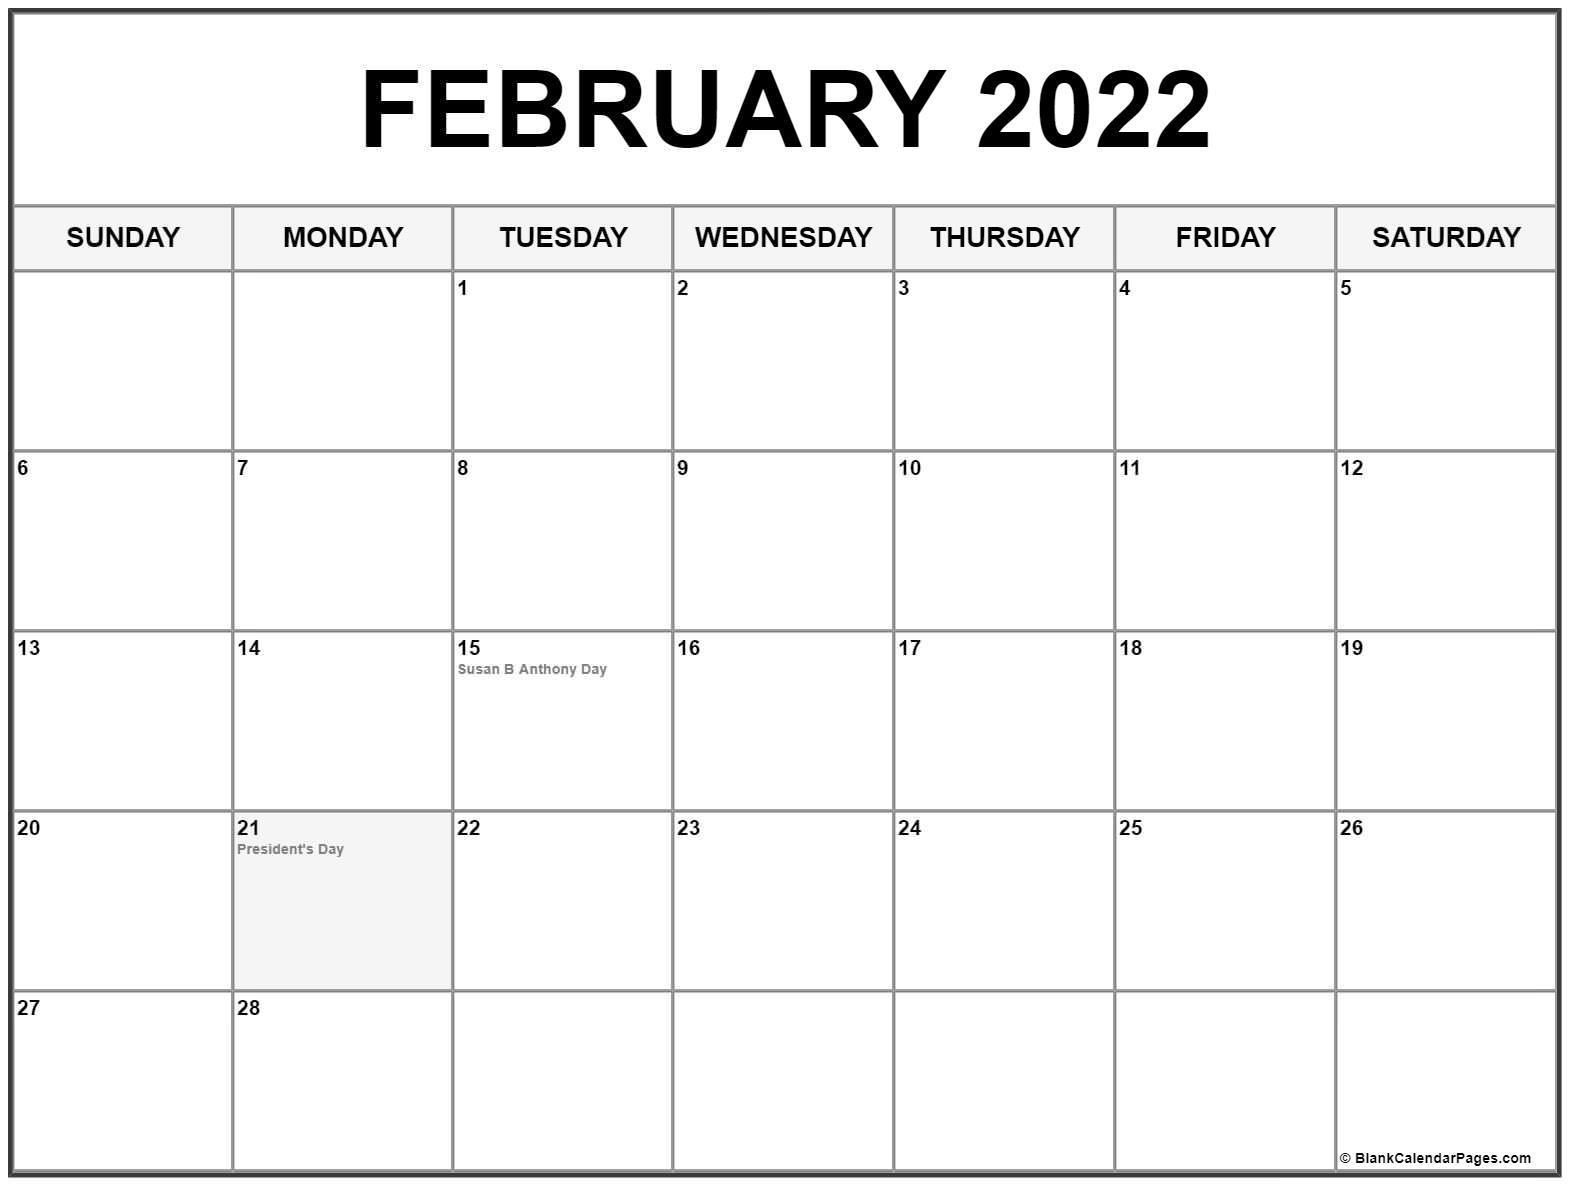 February 2022 Calendar With Holidays Intended For February 2022 Calendar Template